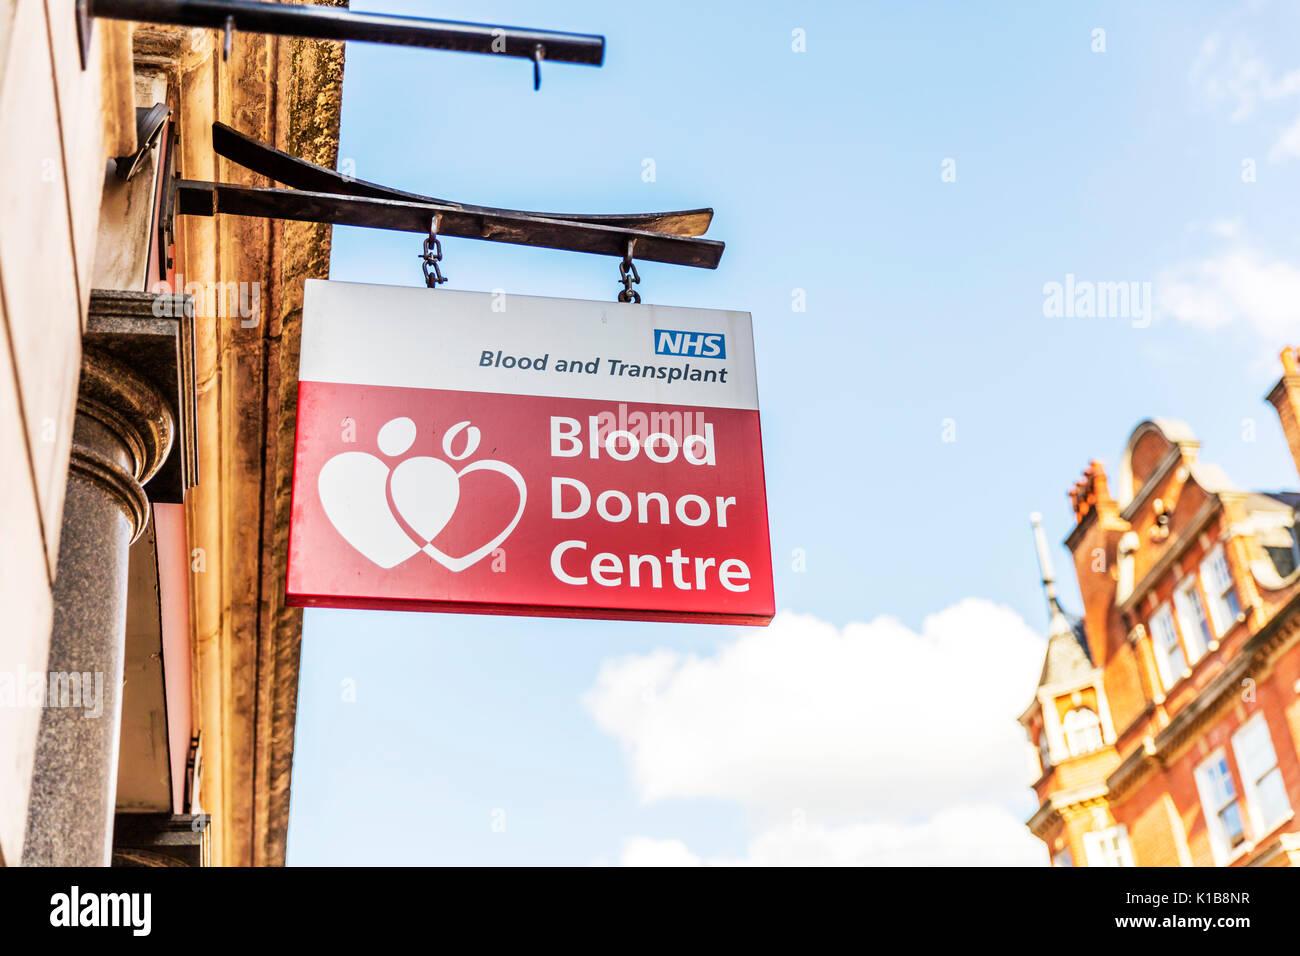 Blood Donor Centre sign, Blood Donor Centre, Blood Donors Centre, Blood Donor Center, donate blood, blood donation, NHS Blood Donor Centre, UK England - Stock Image